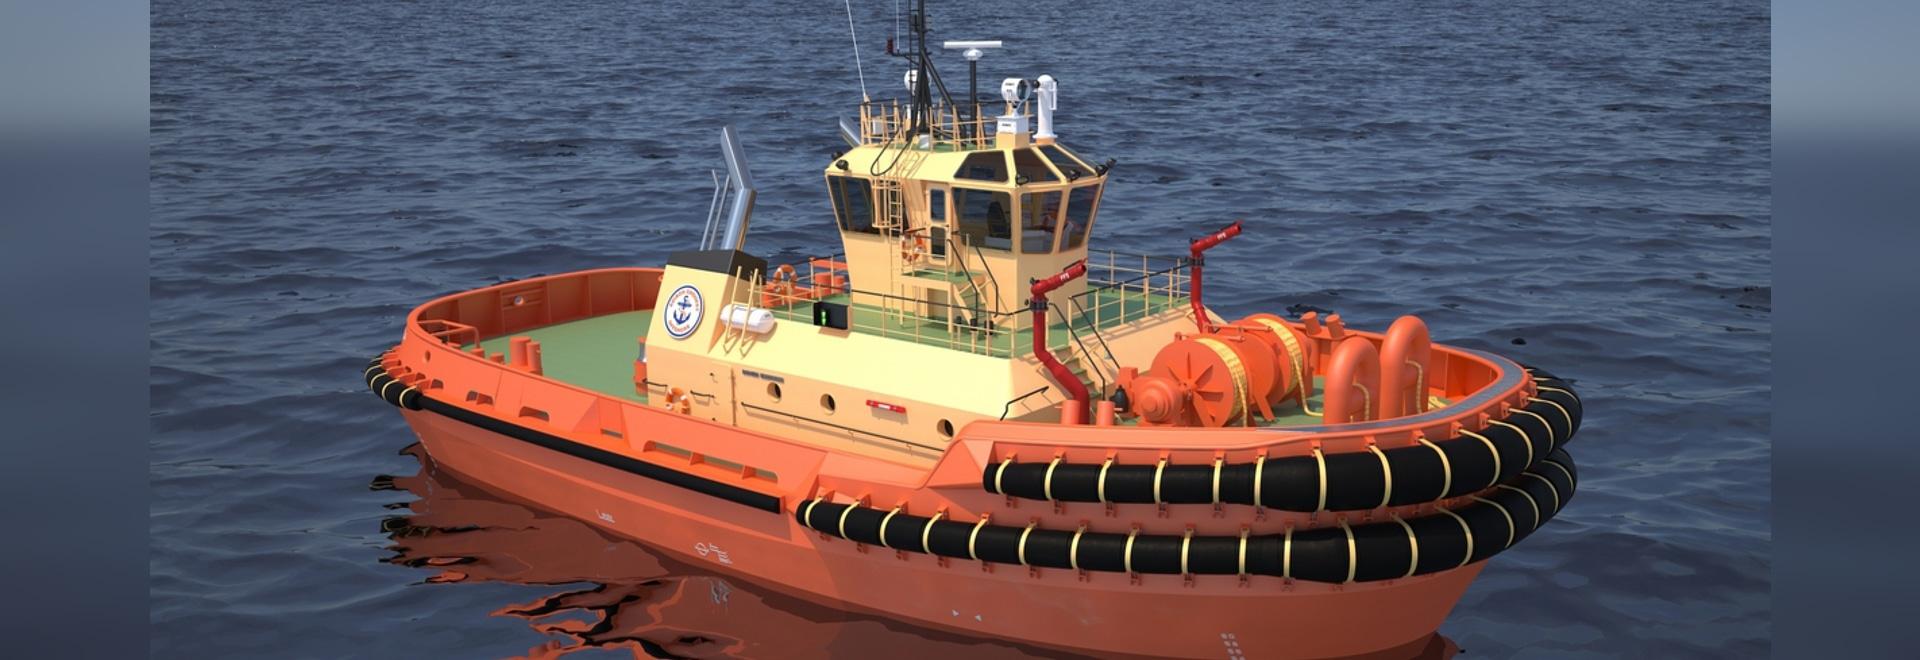 Four ASD 3212s are part of the 13 vessel US order for Damen (Damen)